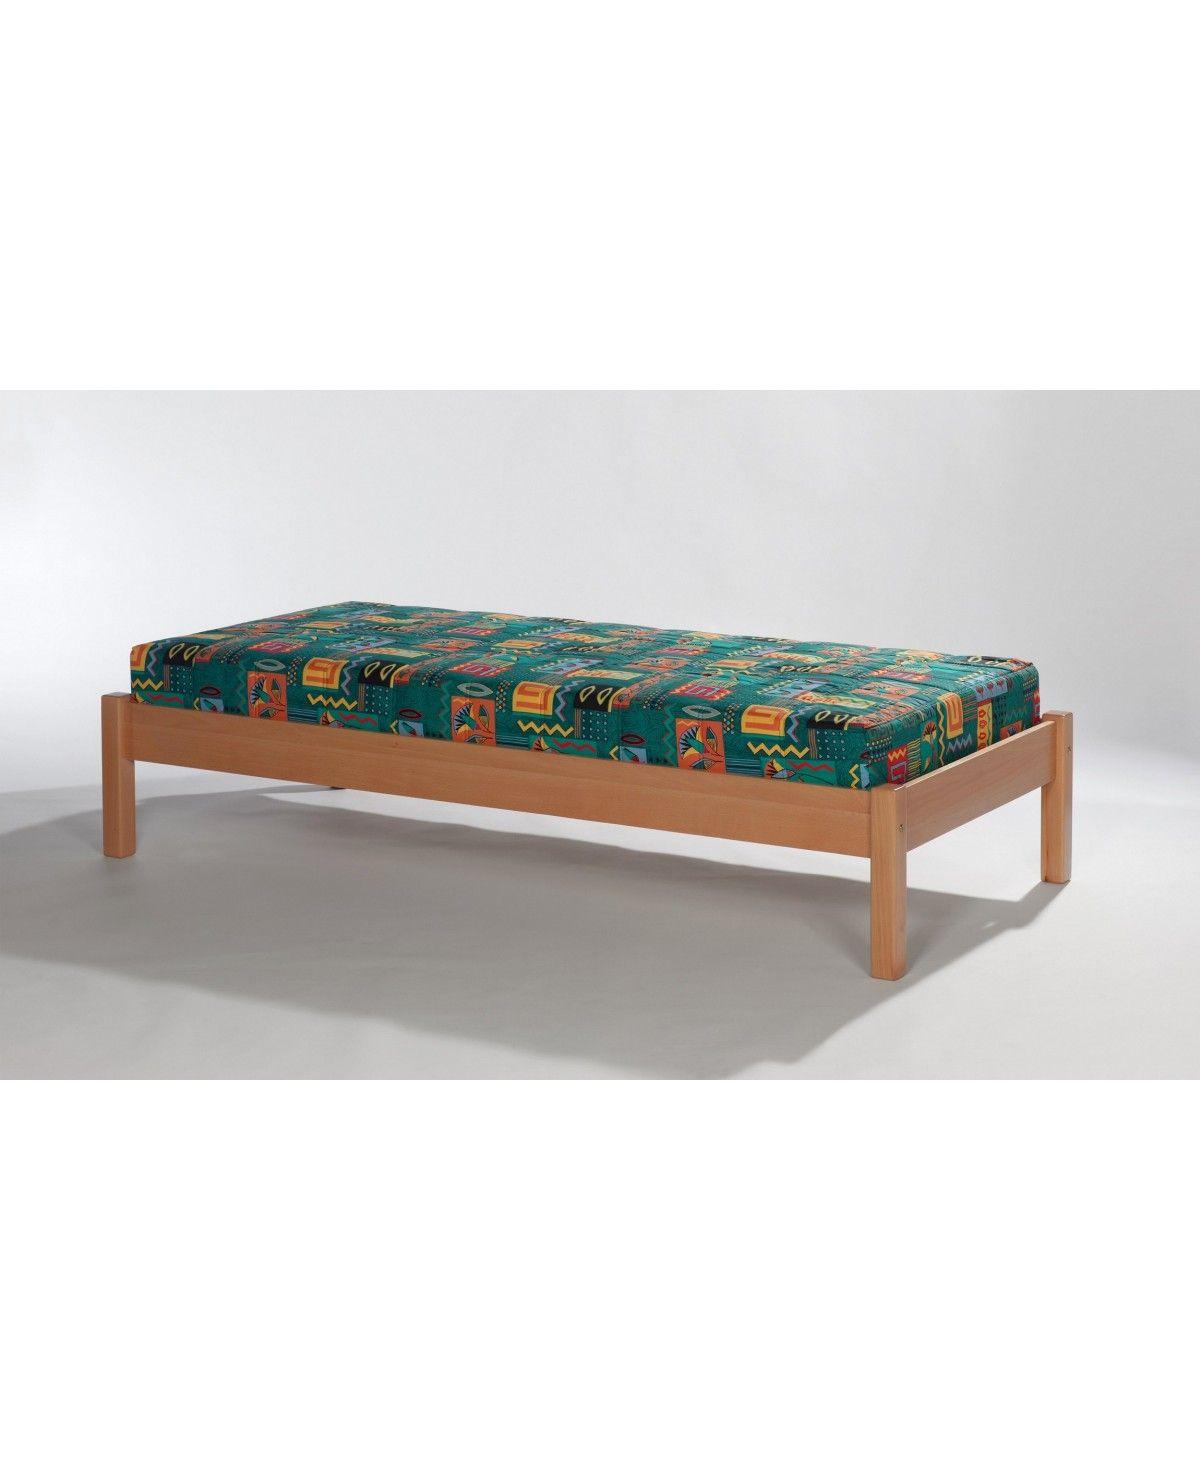 massivholz bett buche natur lackiert 90x200. Black Bedroom Furniture Sets. Home Design Ideas